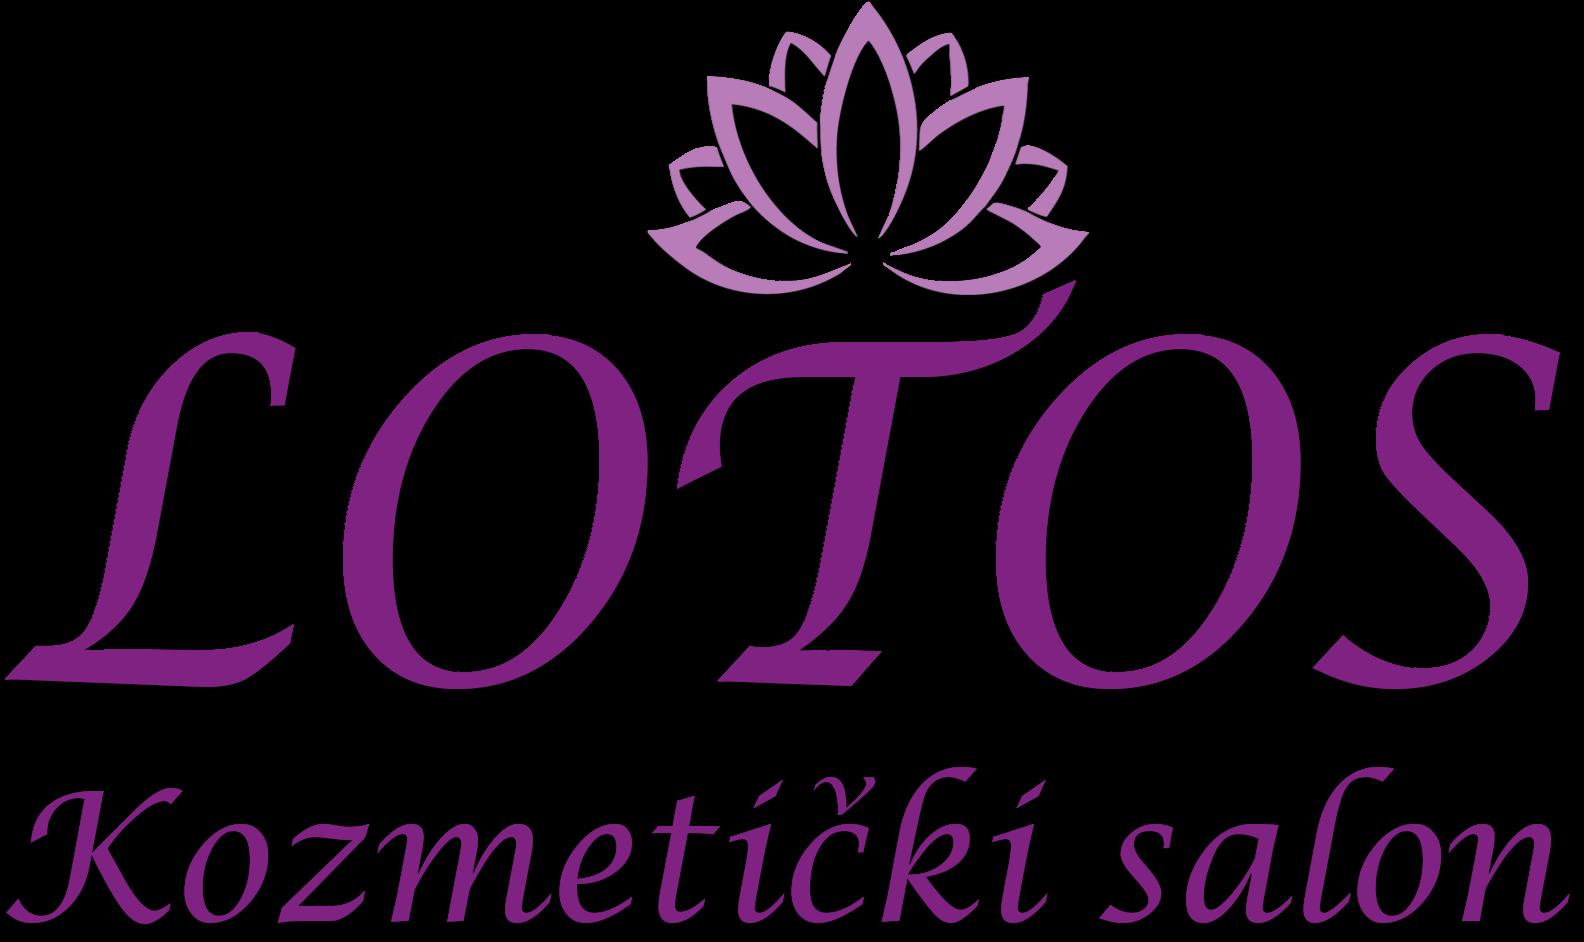 Kozmetički salon Lotos